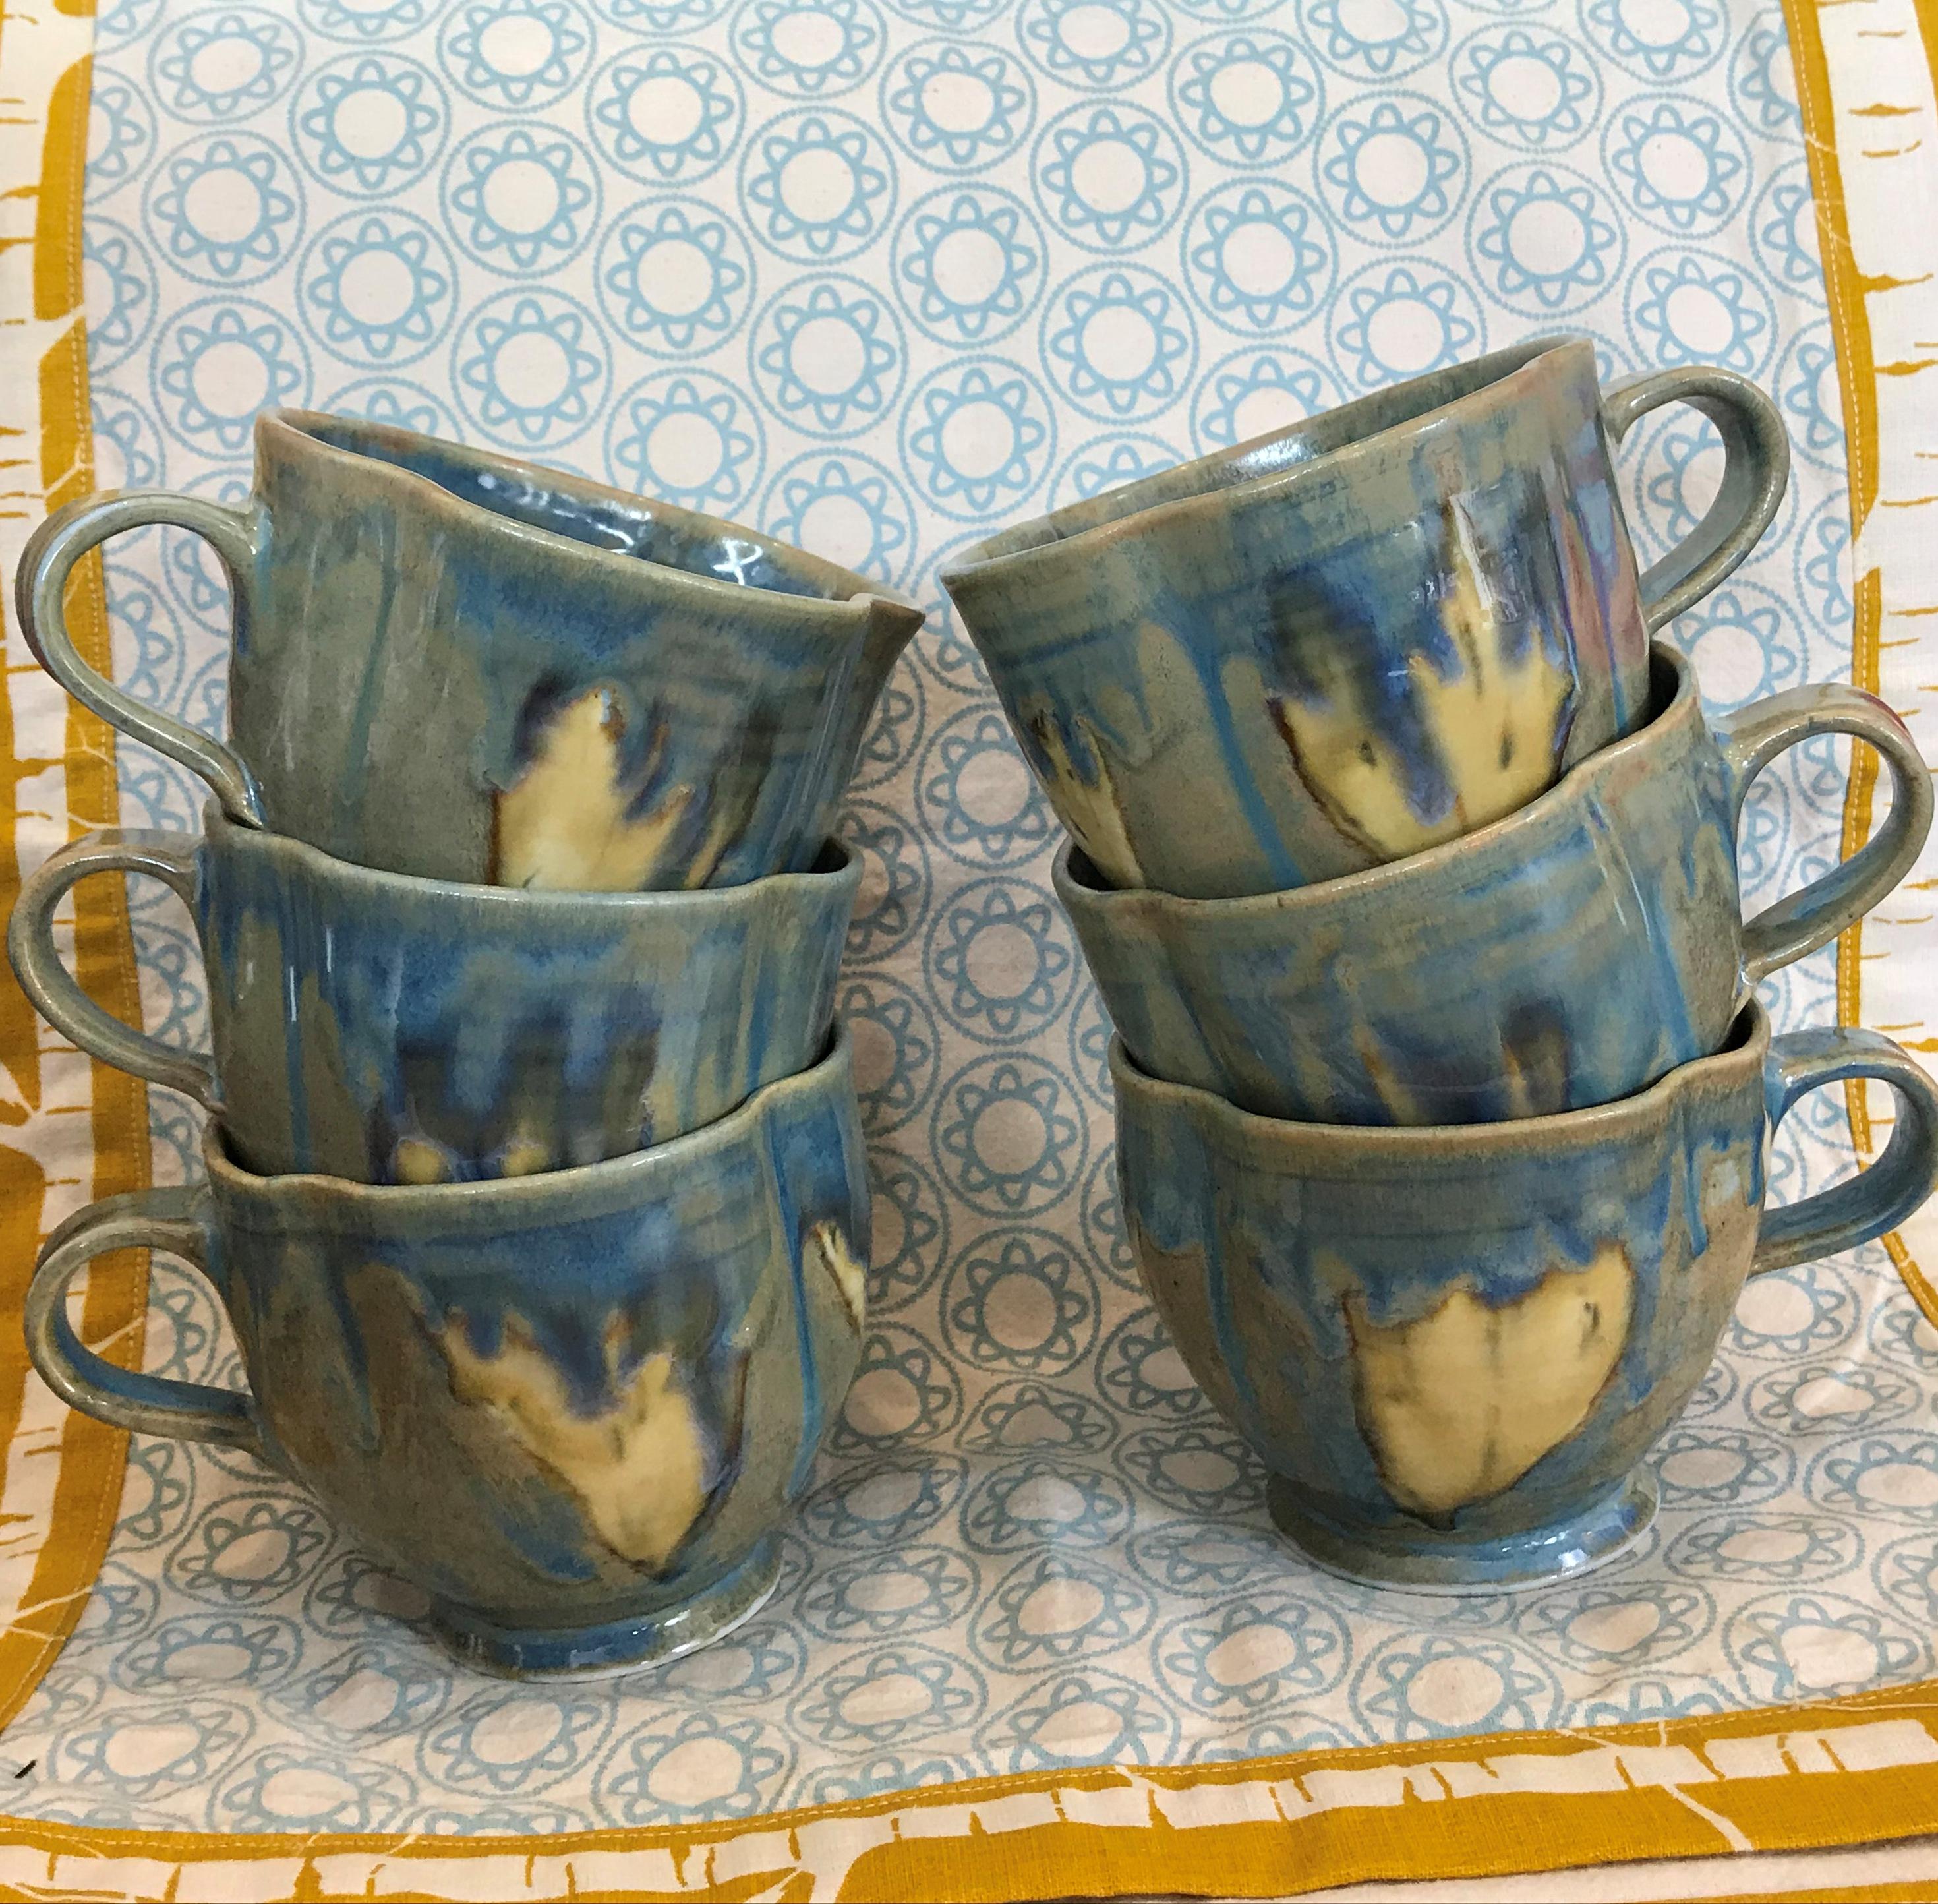 beautiful blue porcelain cups handmade by Rosemary O'Hara Pottery